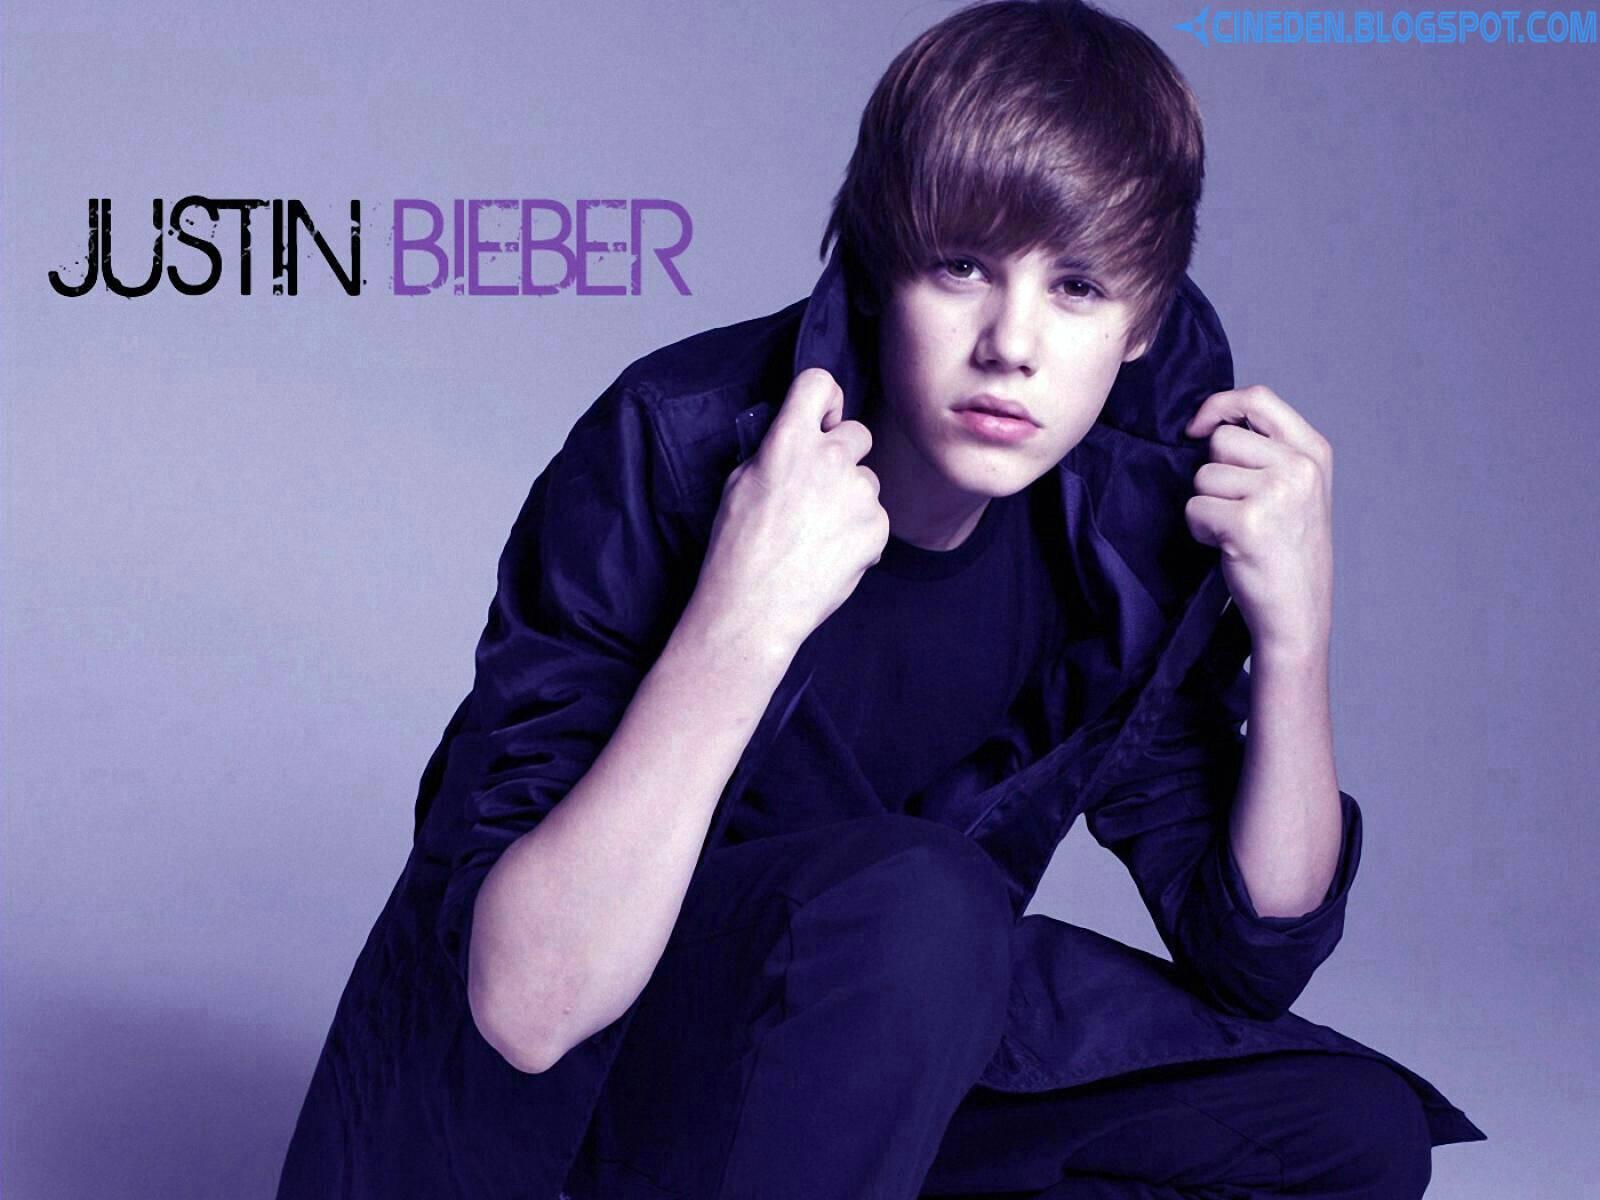 Carly Rae Jepsen : I believe in Justin Bieber